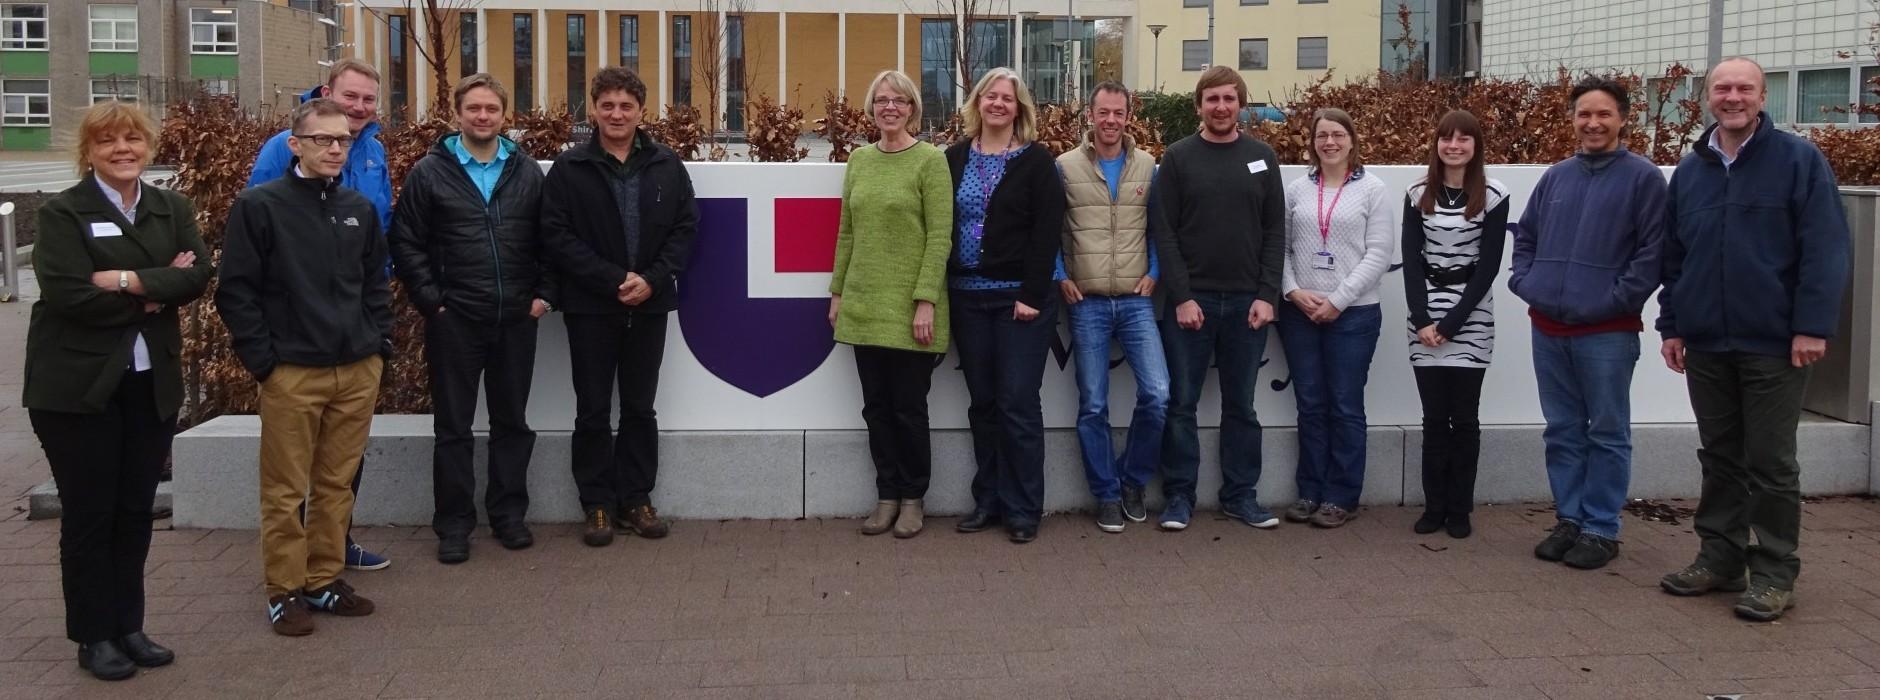 HLCCD Network Meeting Feb 2015